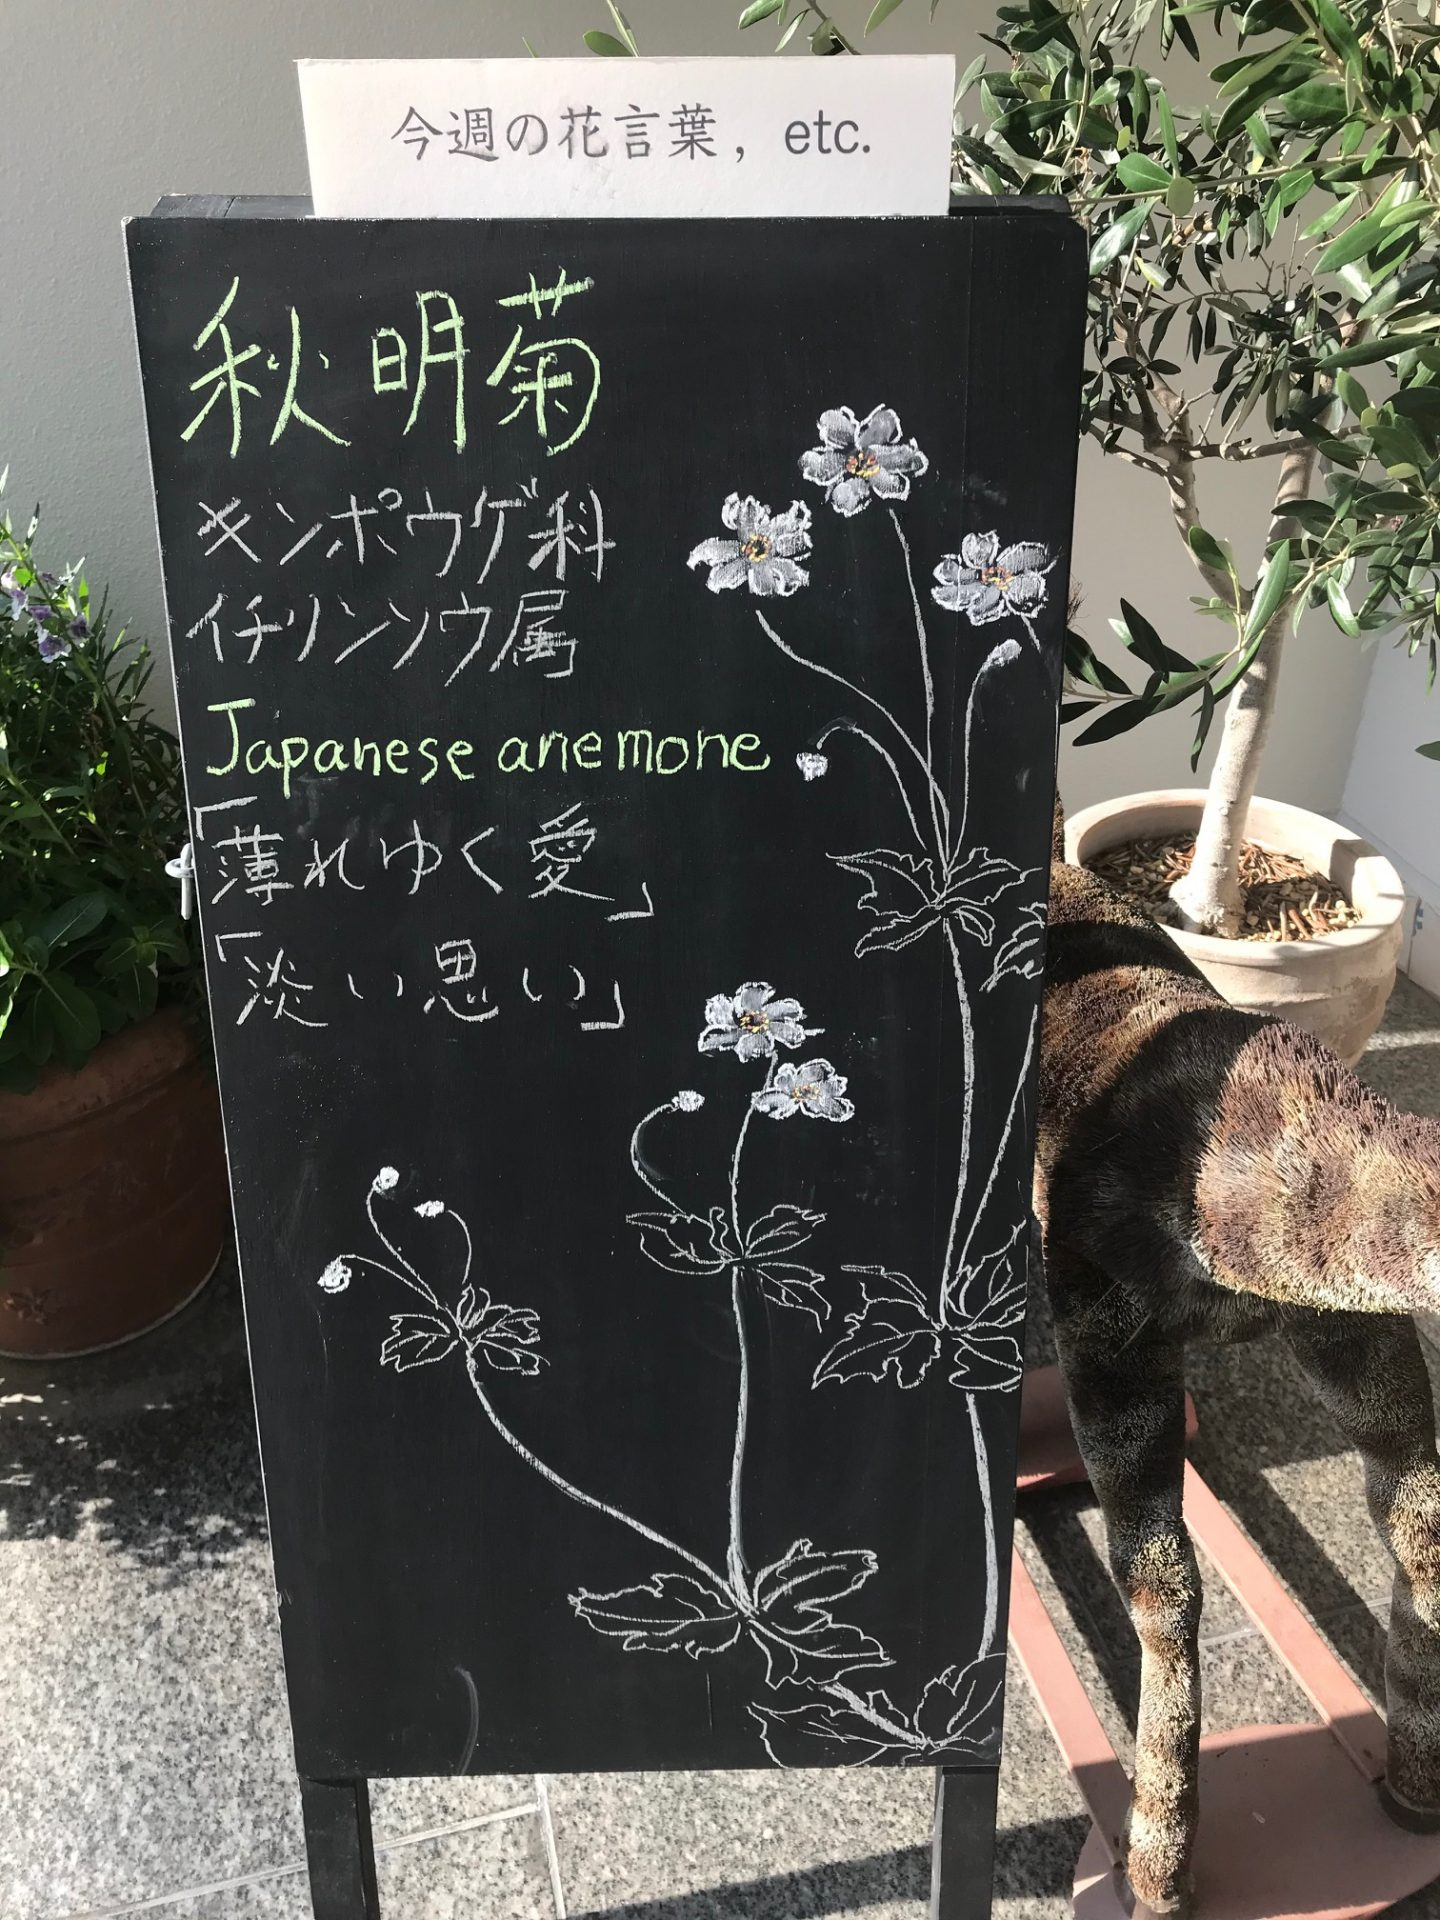 ⁑⁑Japanese anemone⁑⁑